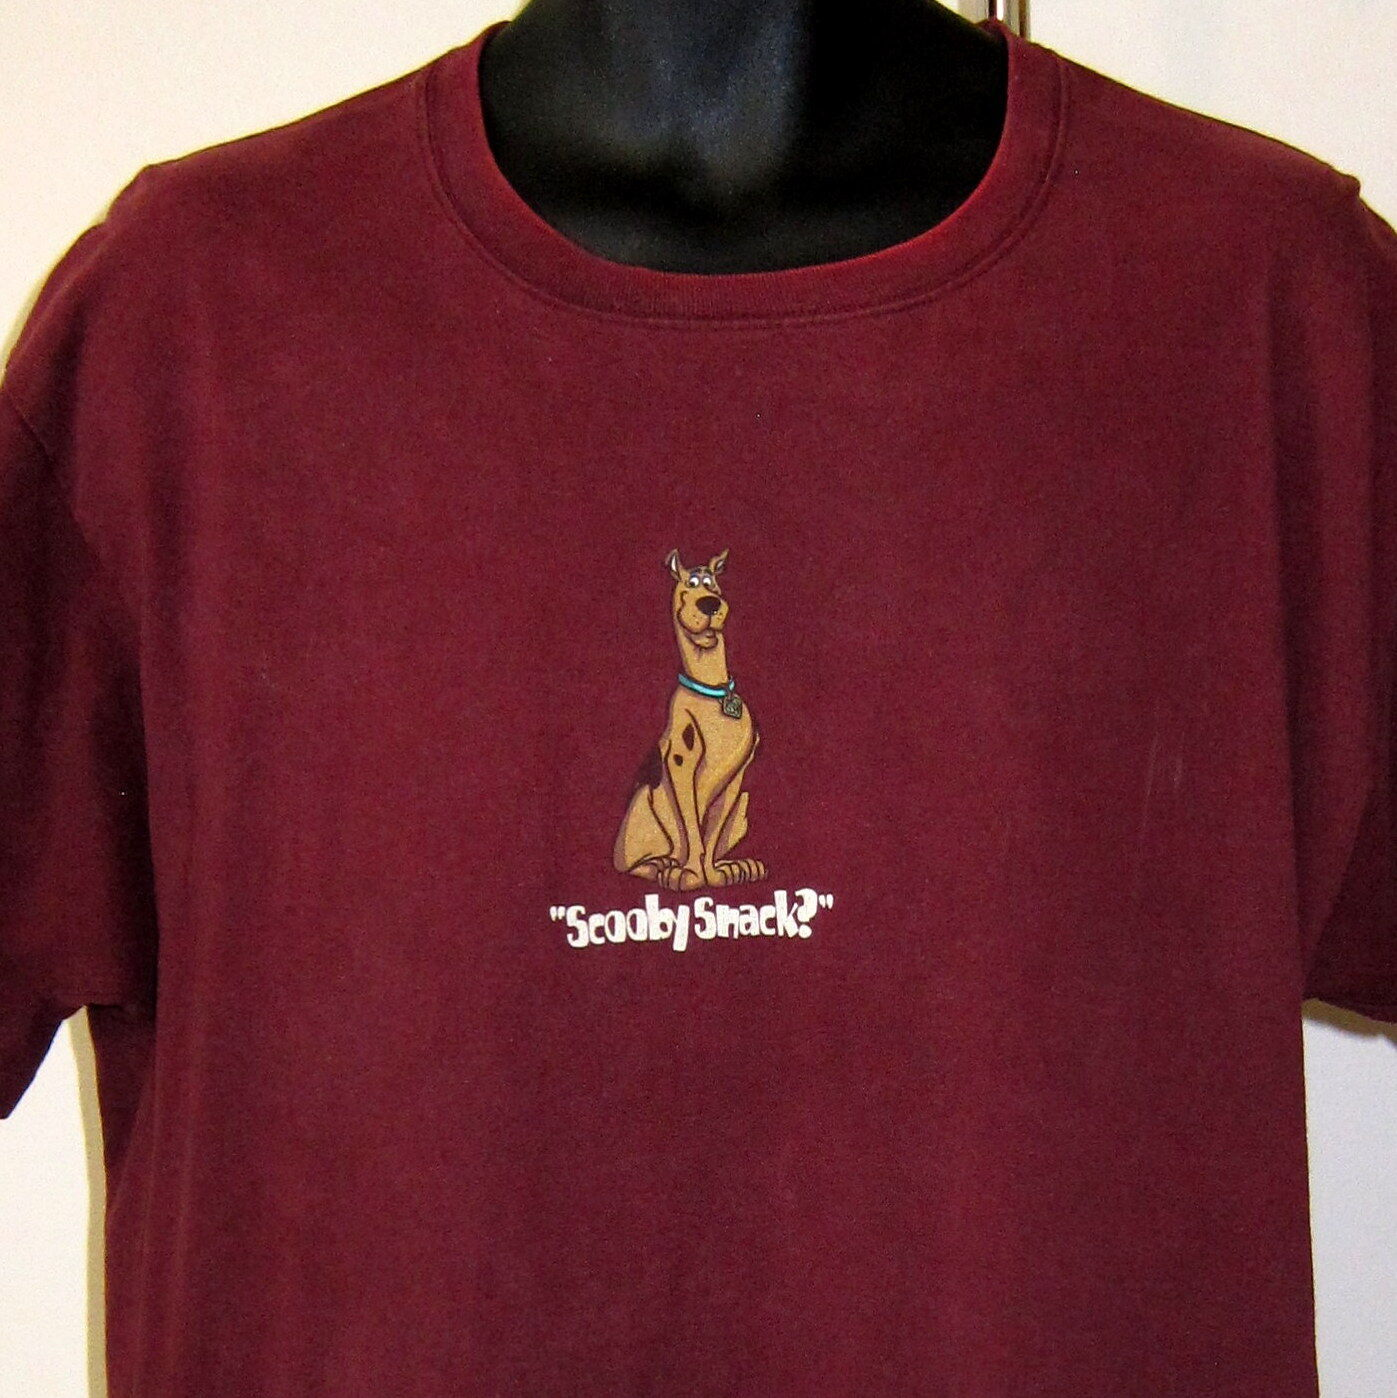 Vtg 1998 XL Scooby Doo Maroon Red T Shirt Warner Bros Studio Cartoon Network USA